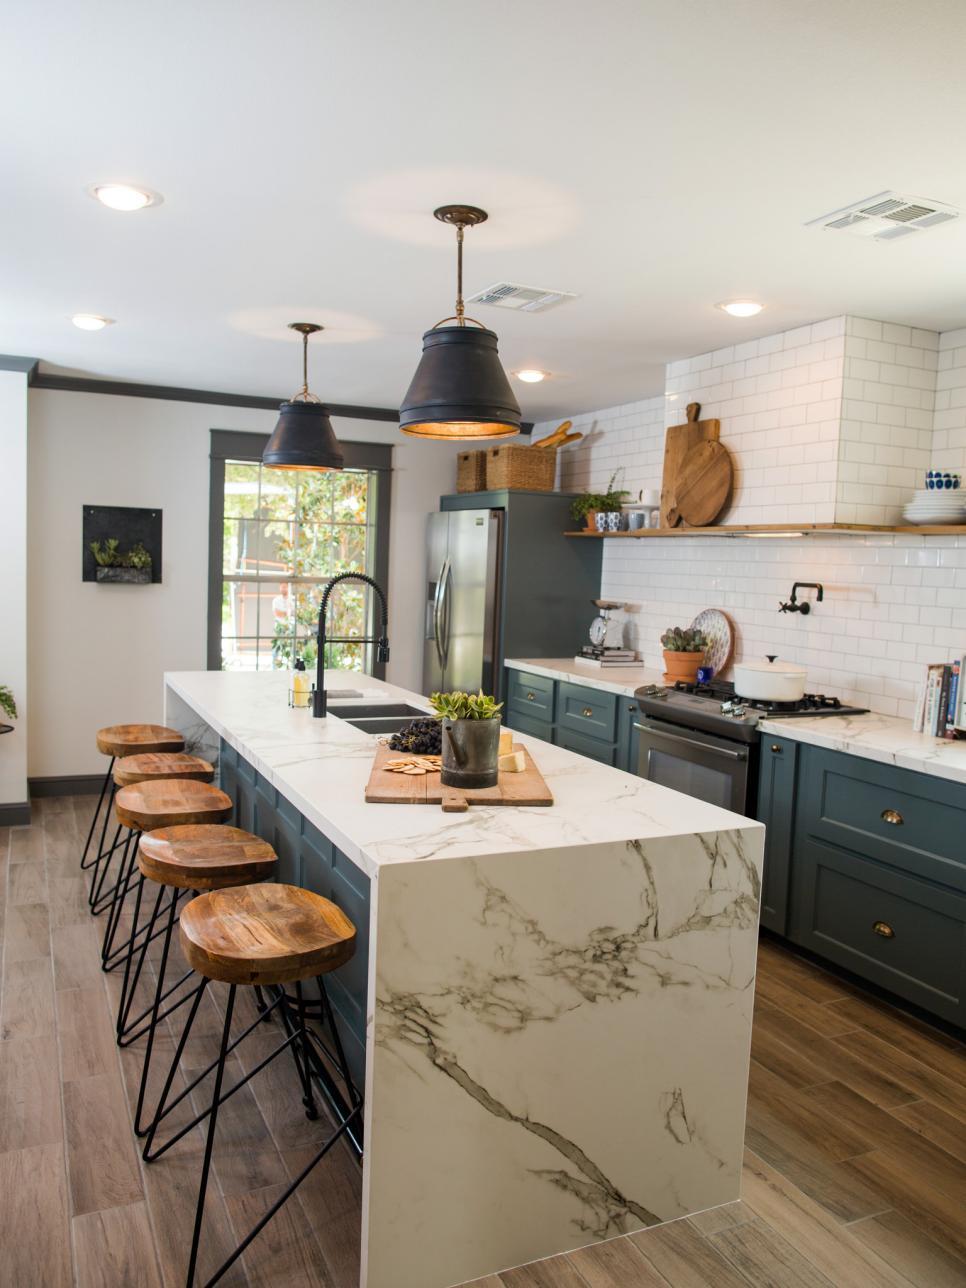 Home interior furniture birge yildirim birgevora on pinterest